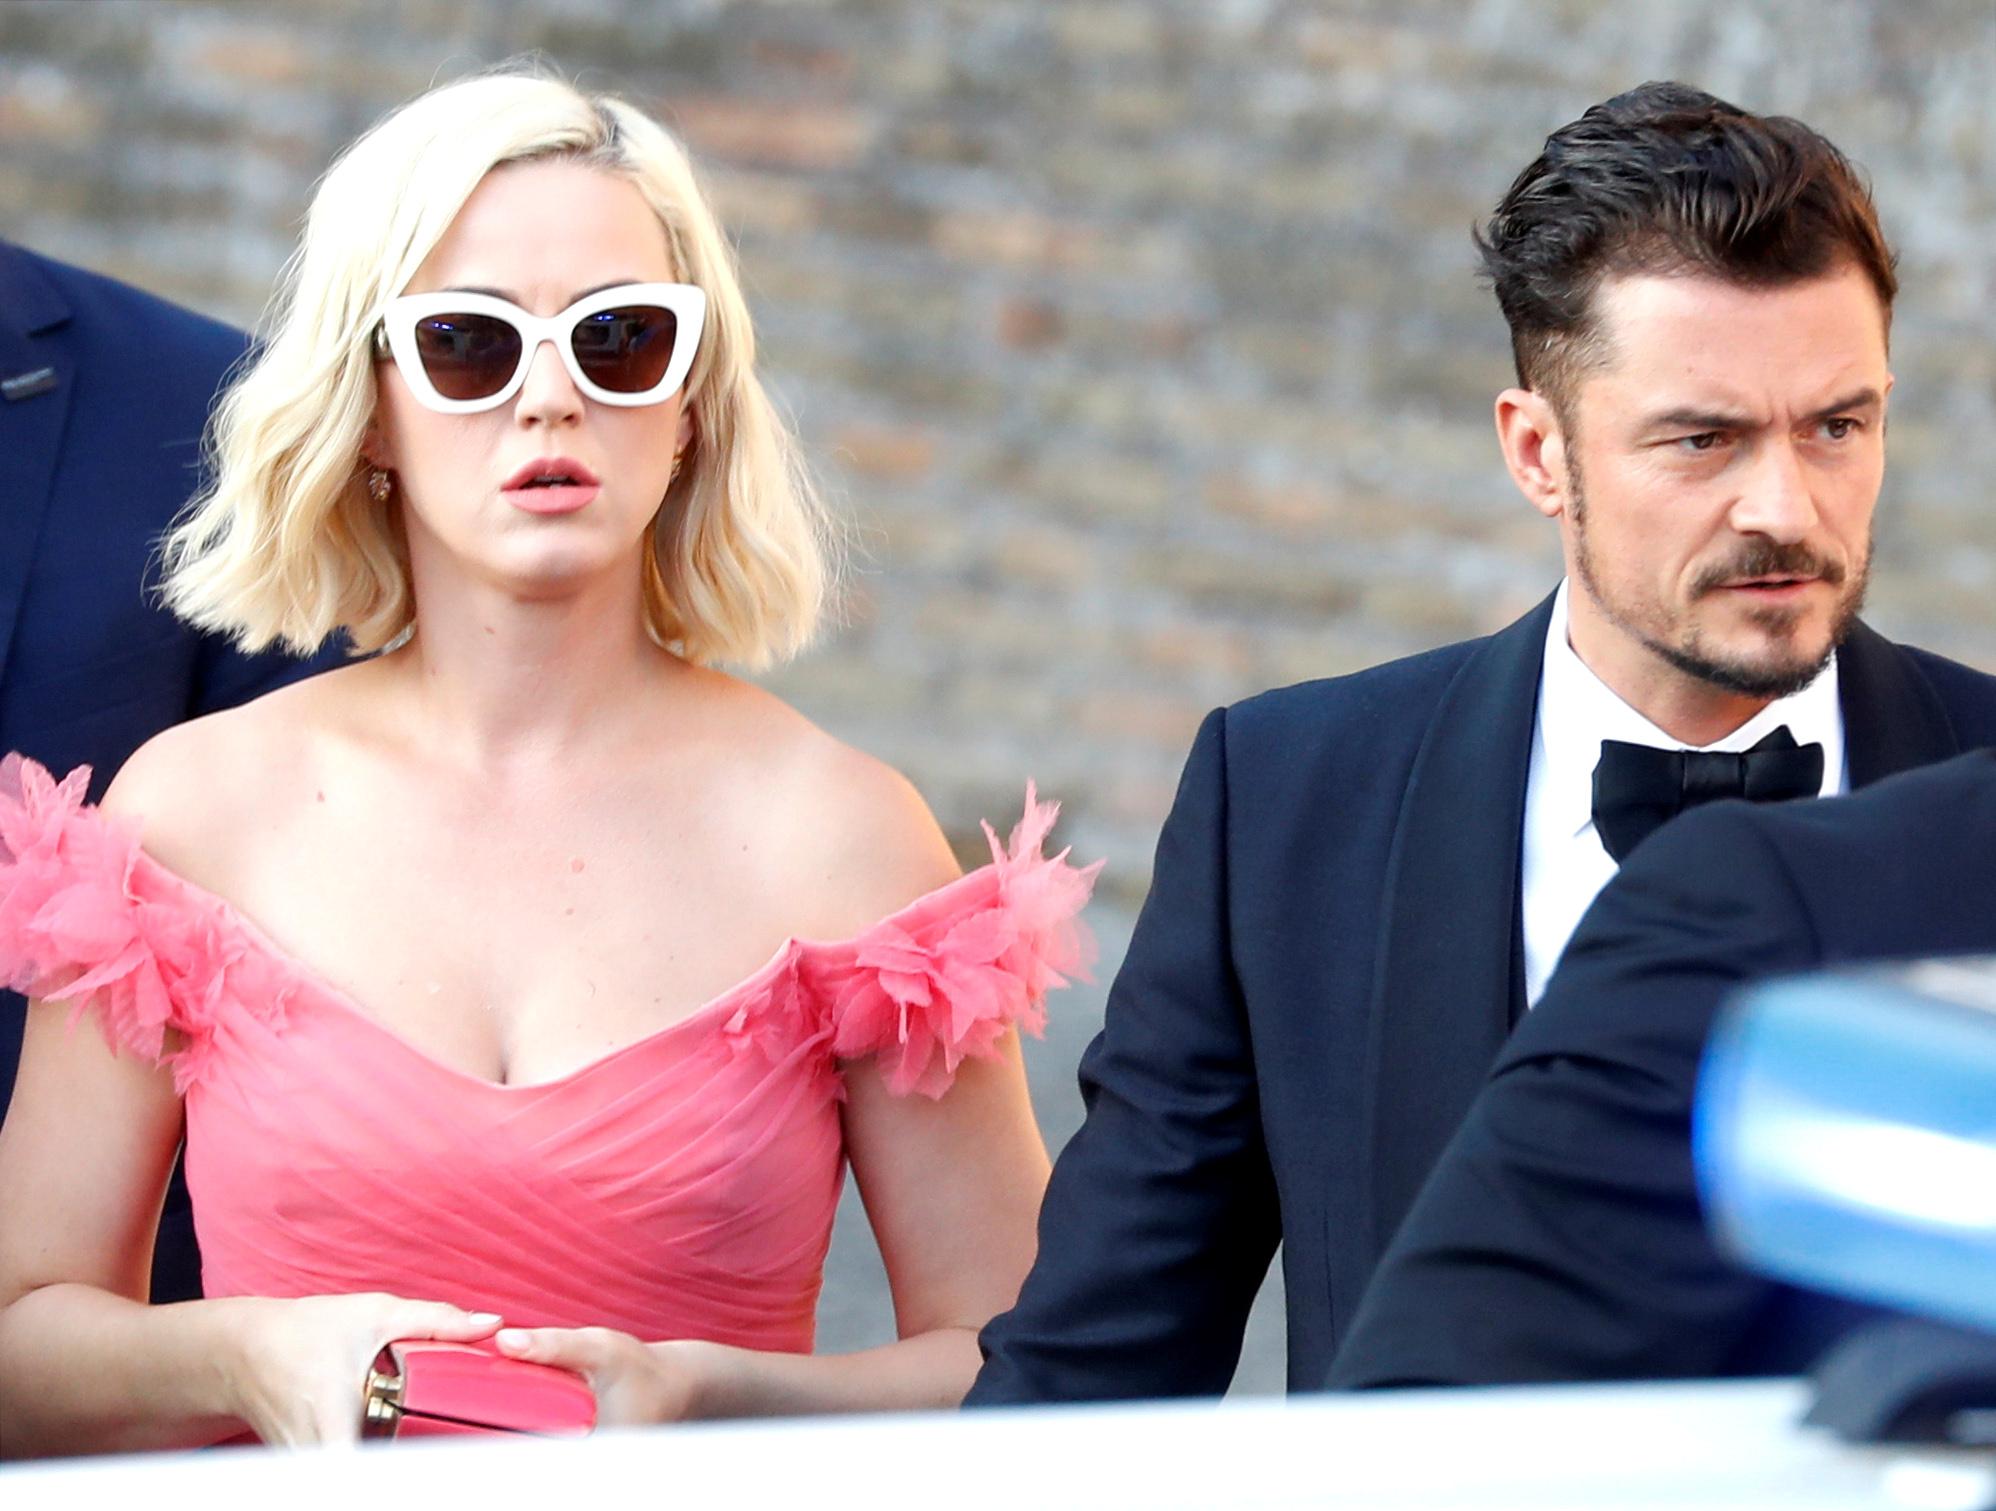 Singer Katy Perry and actor Orlando Bloom arrive to attend the wedding of fashion designer Misha Nonoo at Villa Aurelia in Rome, Italy, September 20, 2019. REUTERS/Yara Nardi